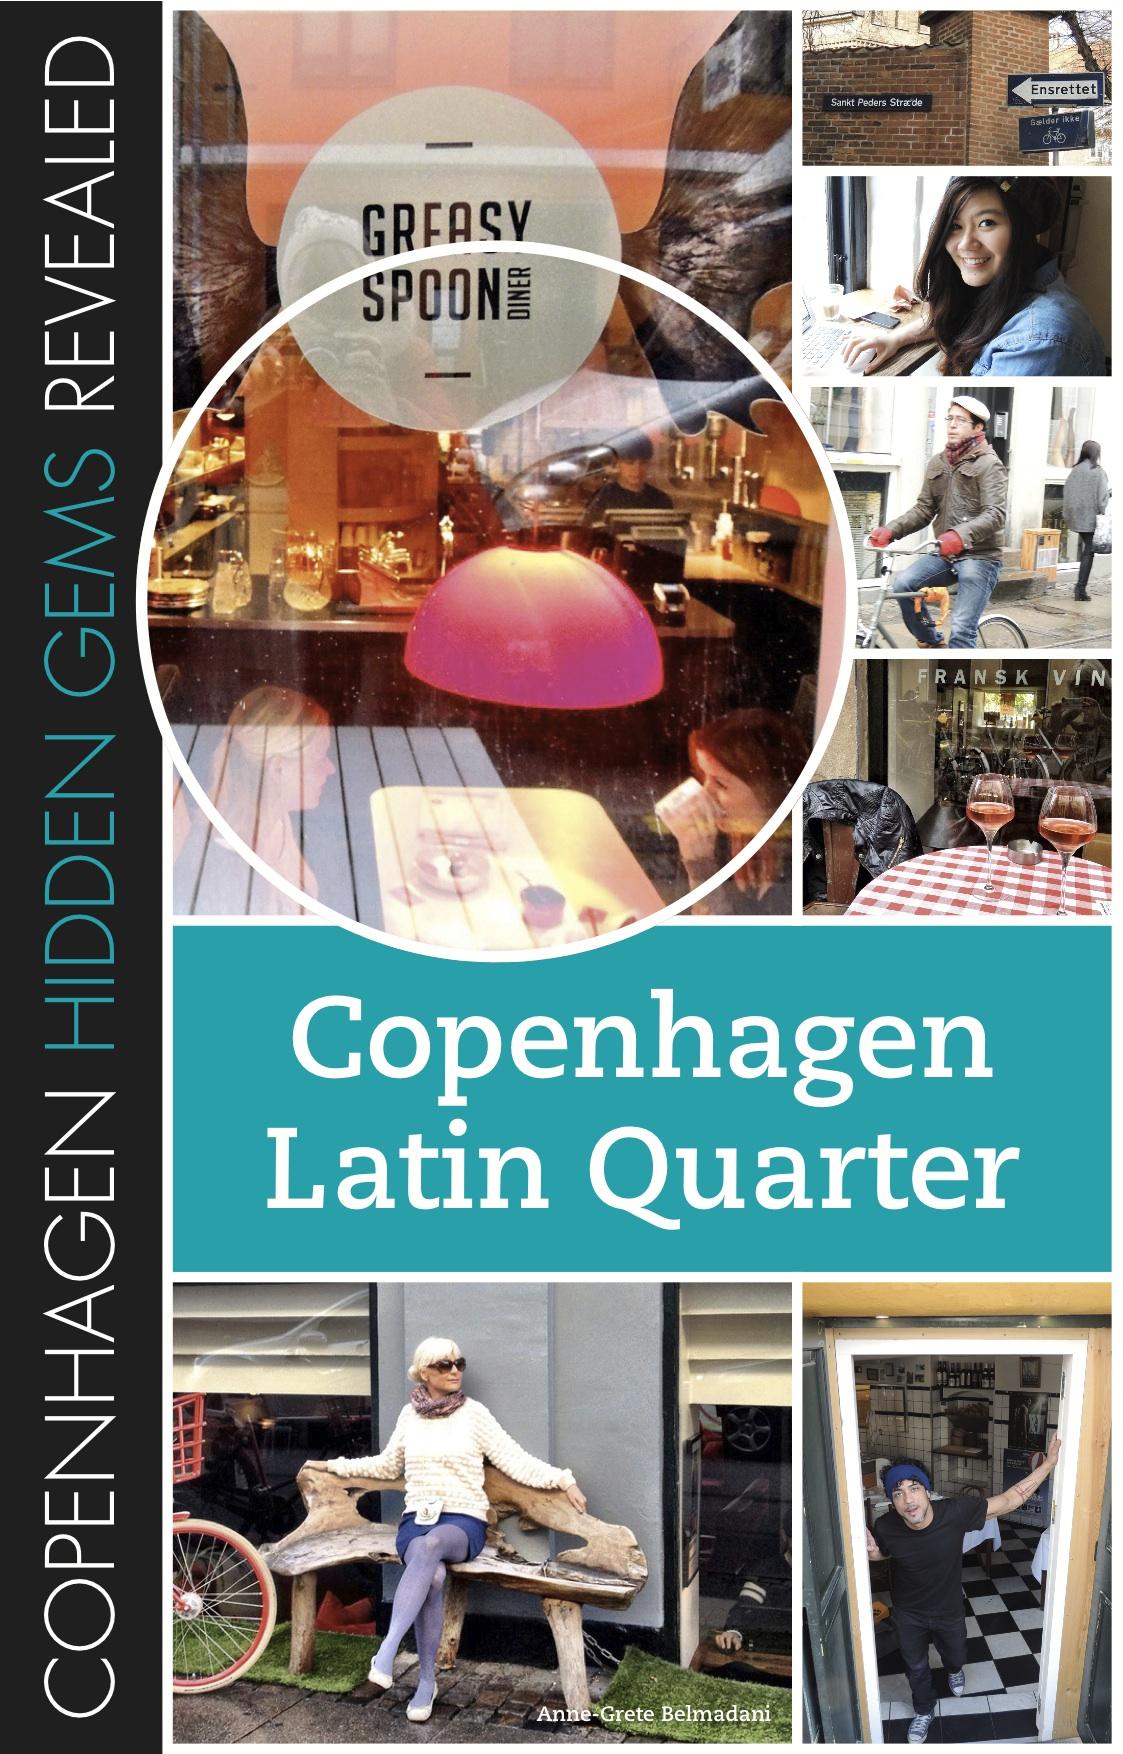 Potential cover 2 for my new ebook #CopenhagenHiddenGems